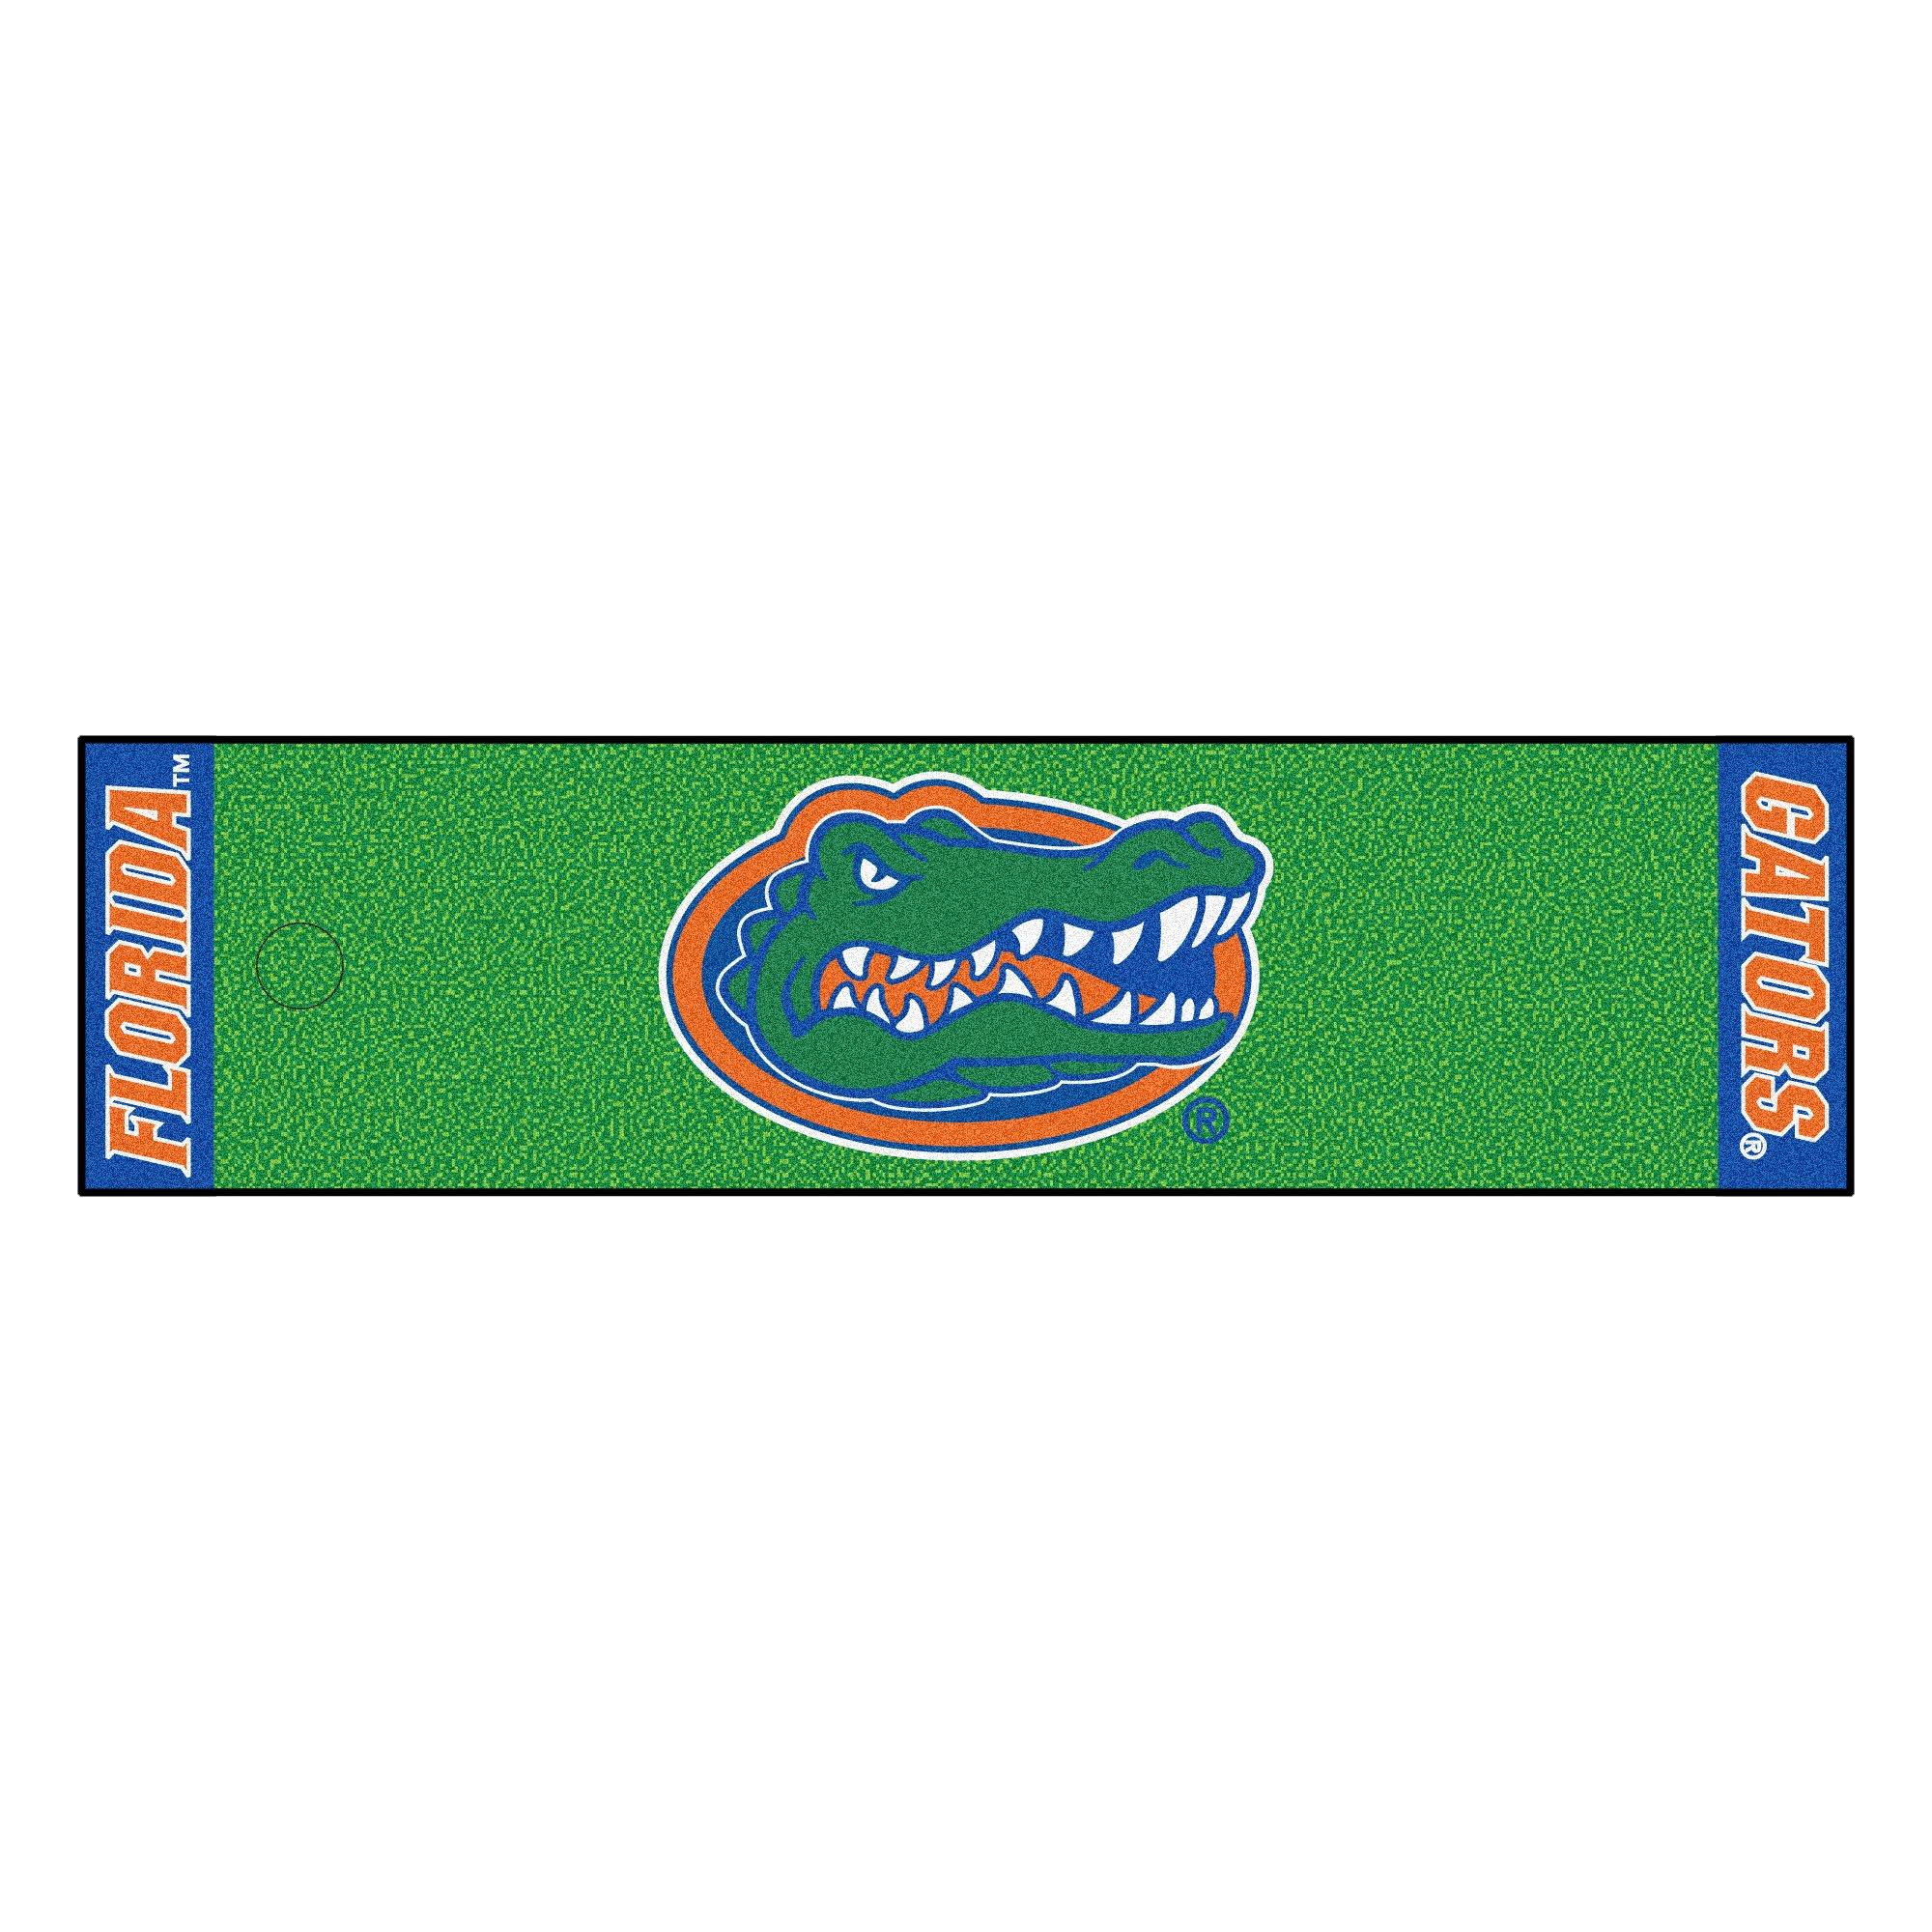 Fanmats NCAA University of Florida Gators Nylon Face Putting Green Mat